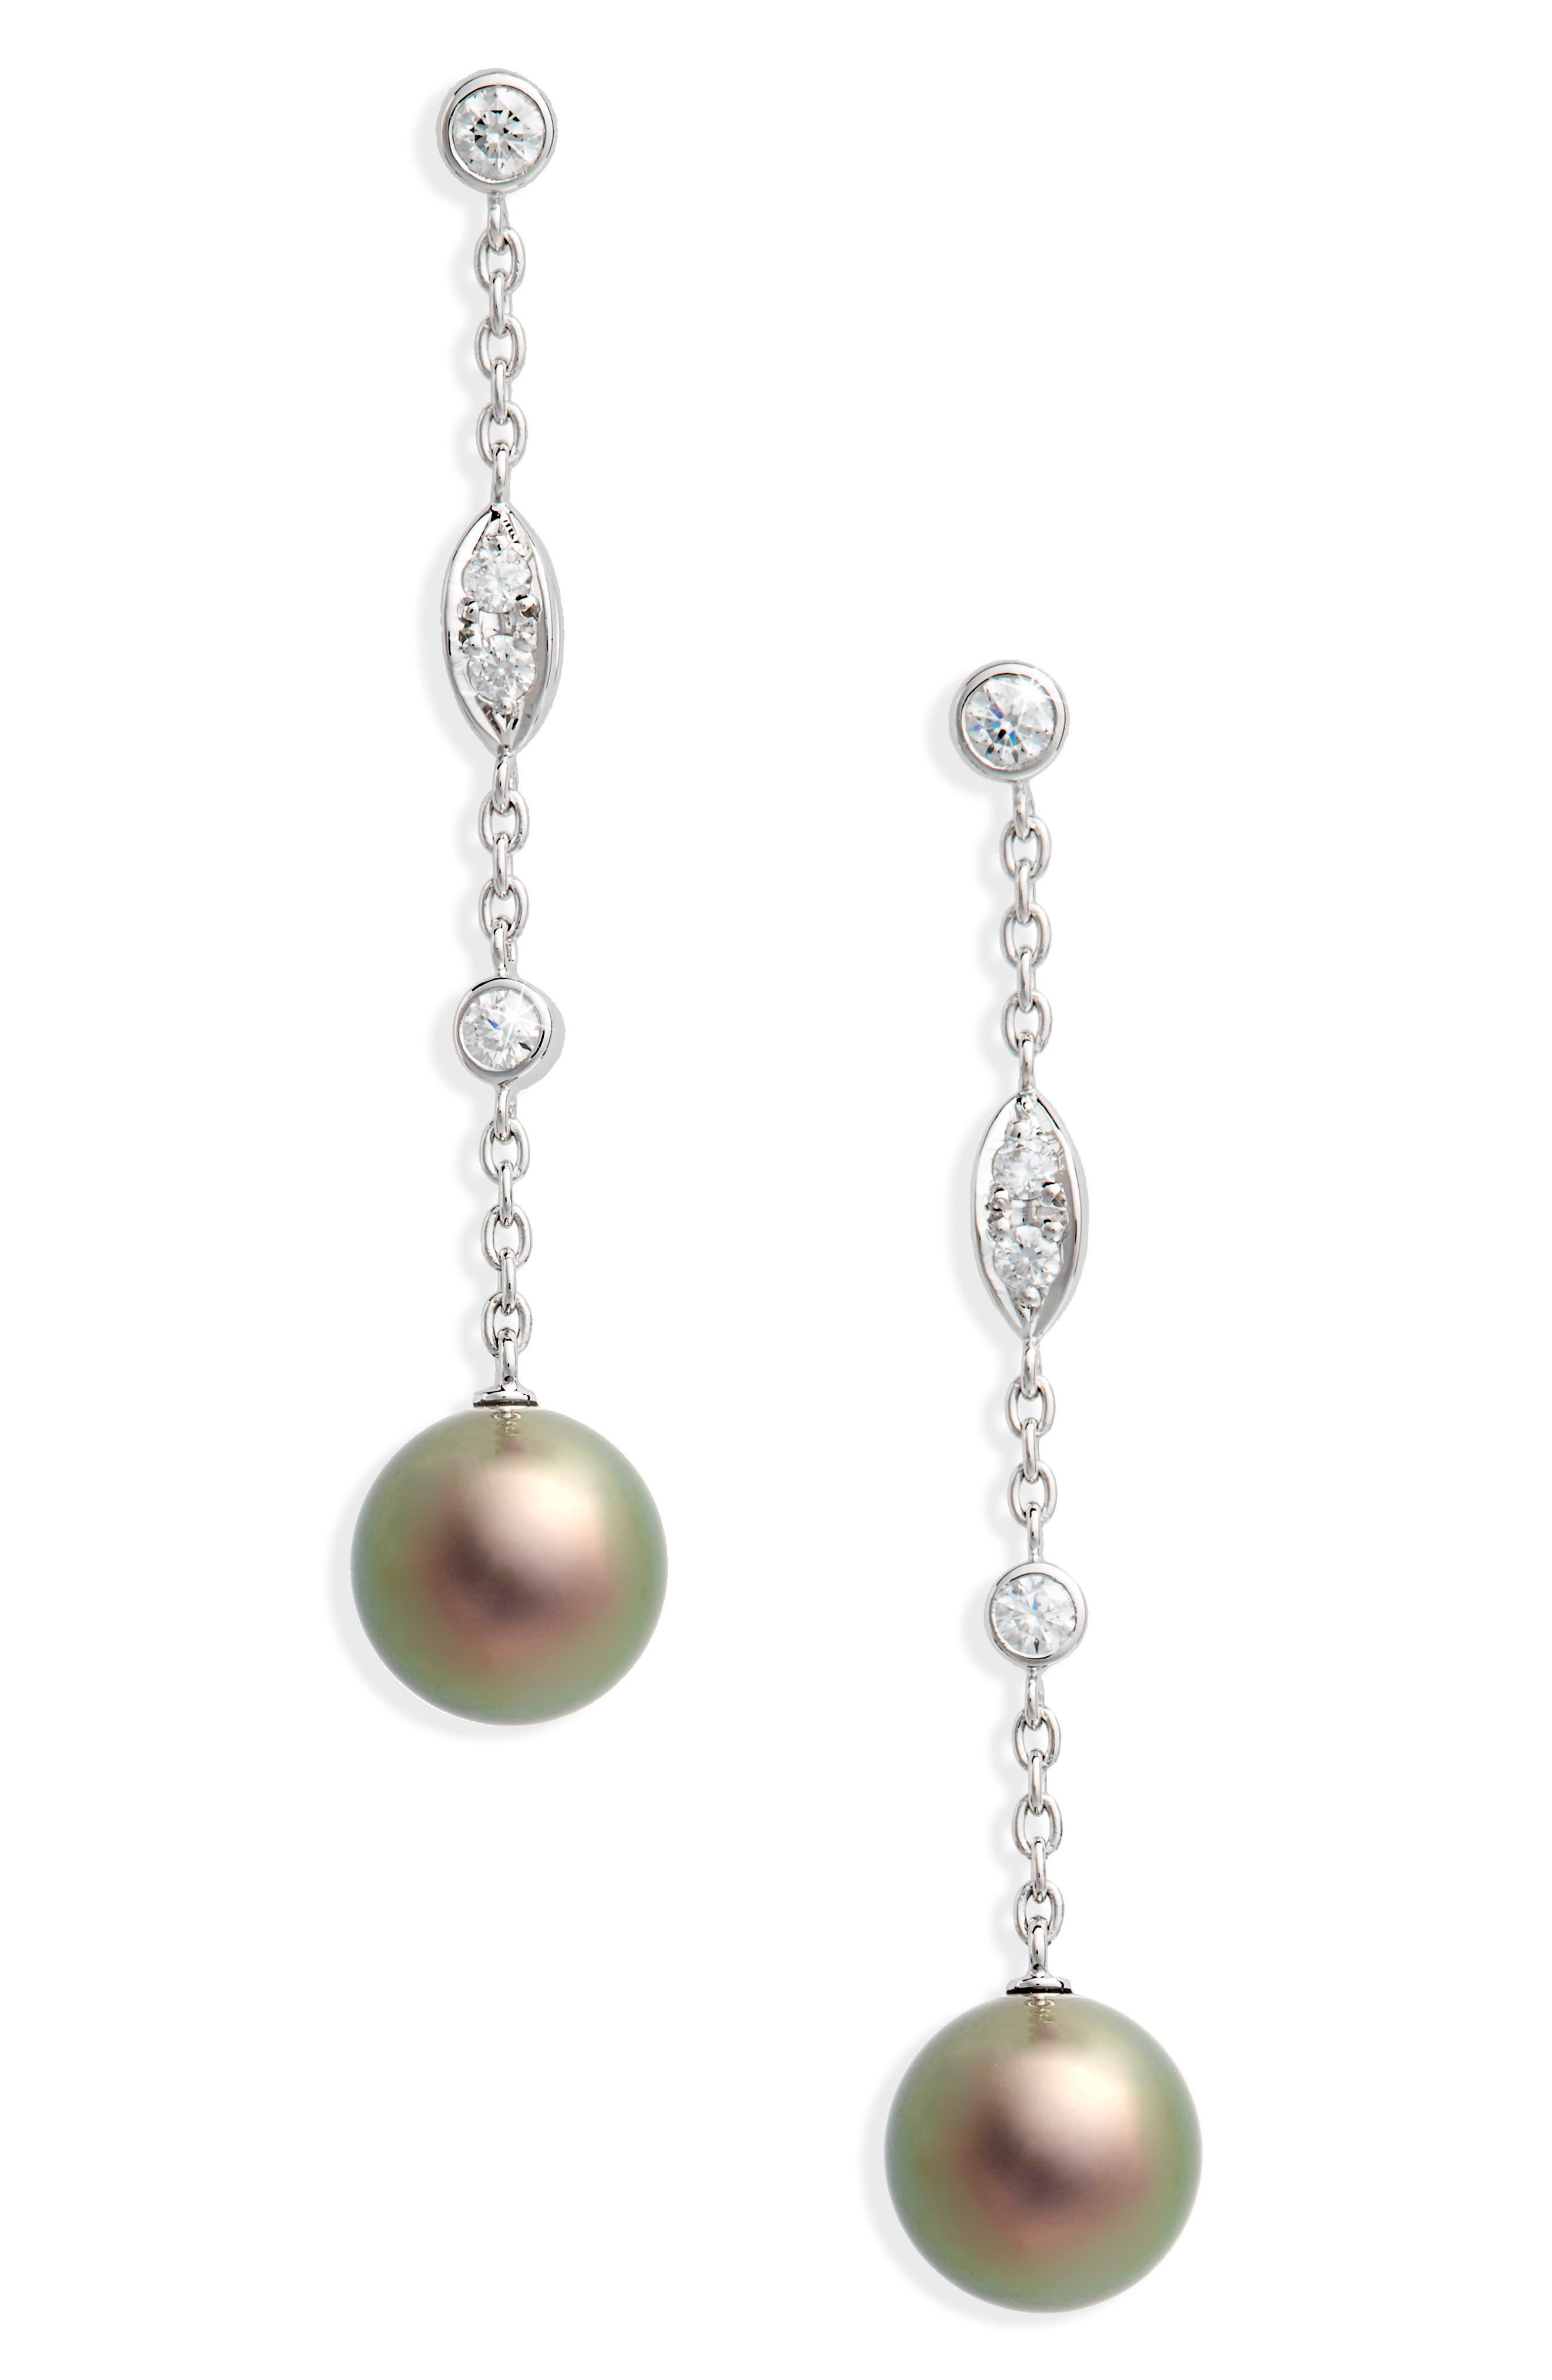 Black South Sea & Diamond Linear Drop Earrings,                         Main,                         color, WHITE GOLD